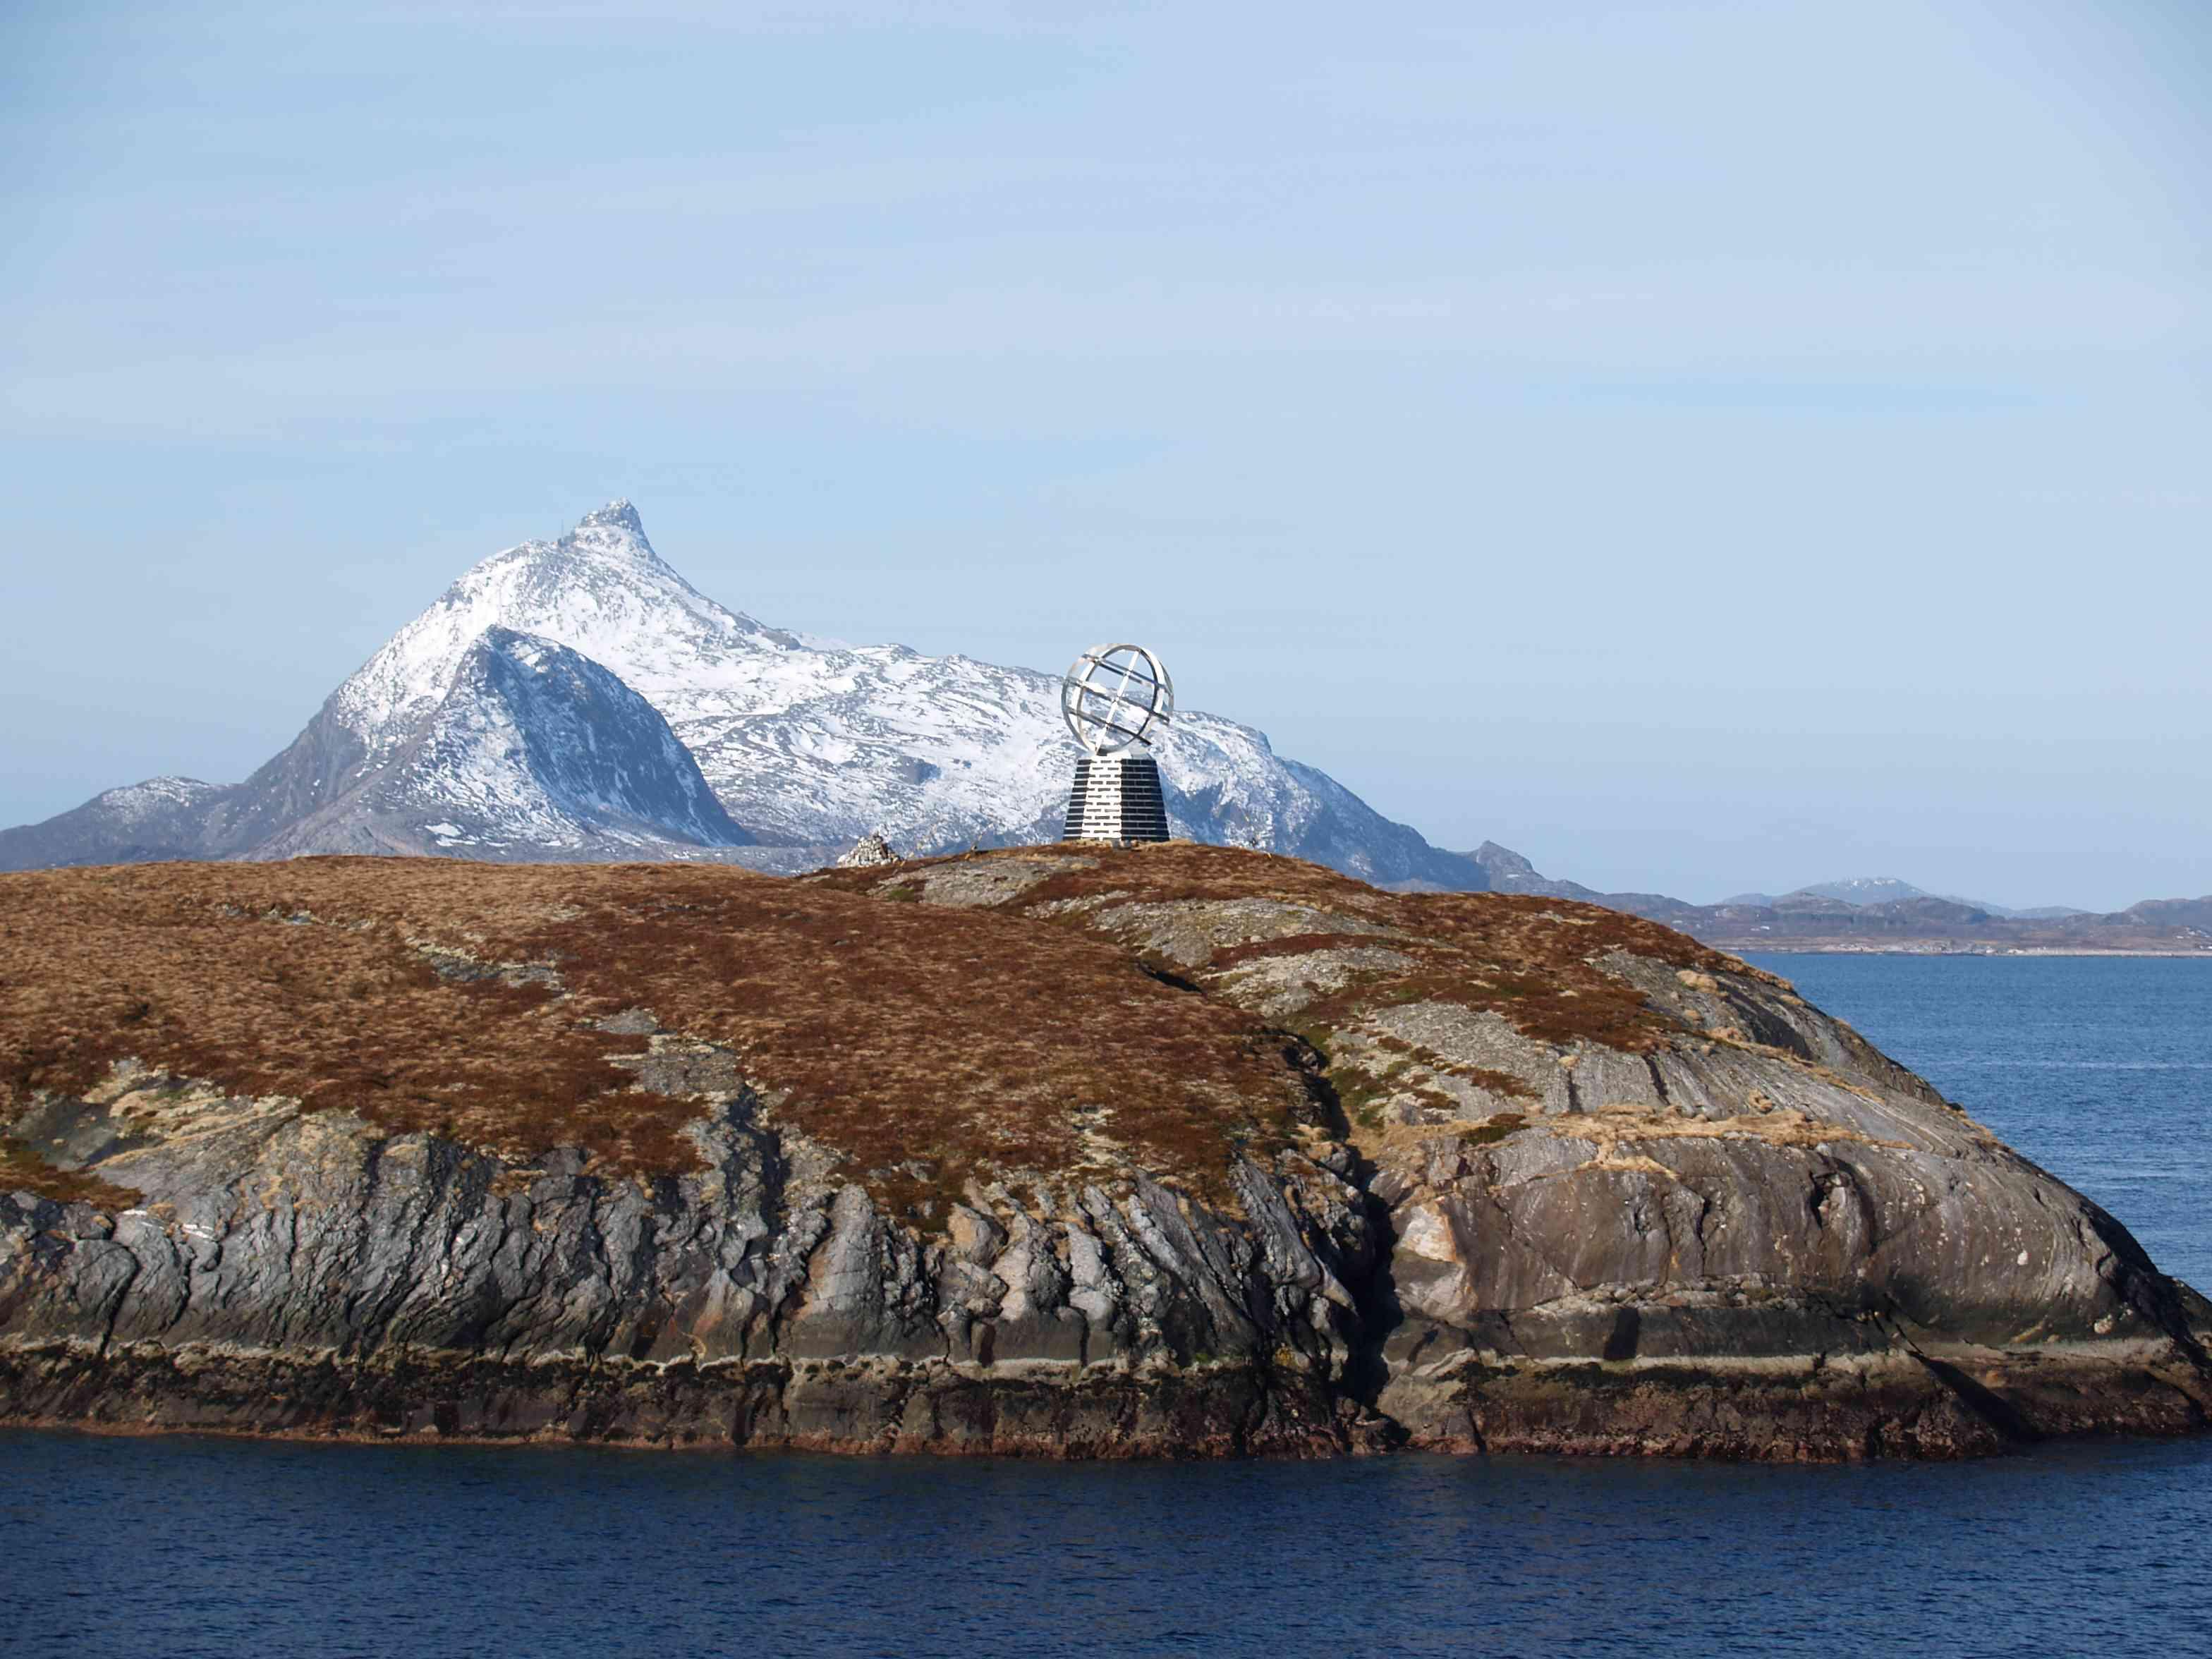 Europäischer Fernwanderweg E1 führt ab Juni bis zum Nordkap